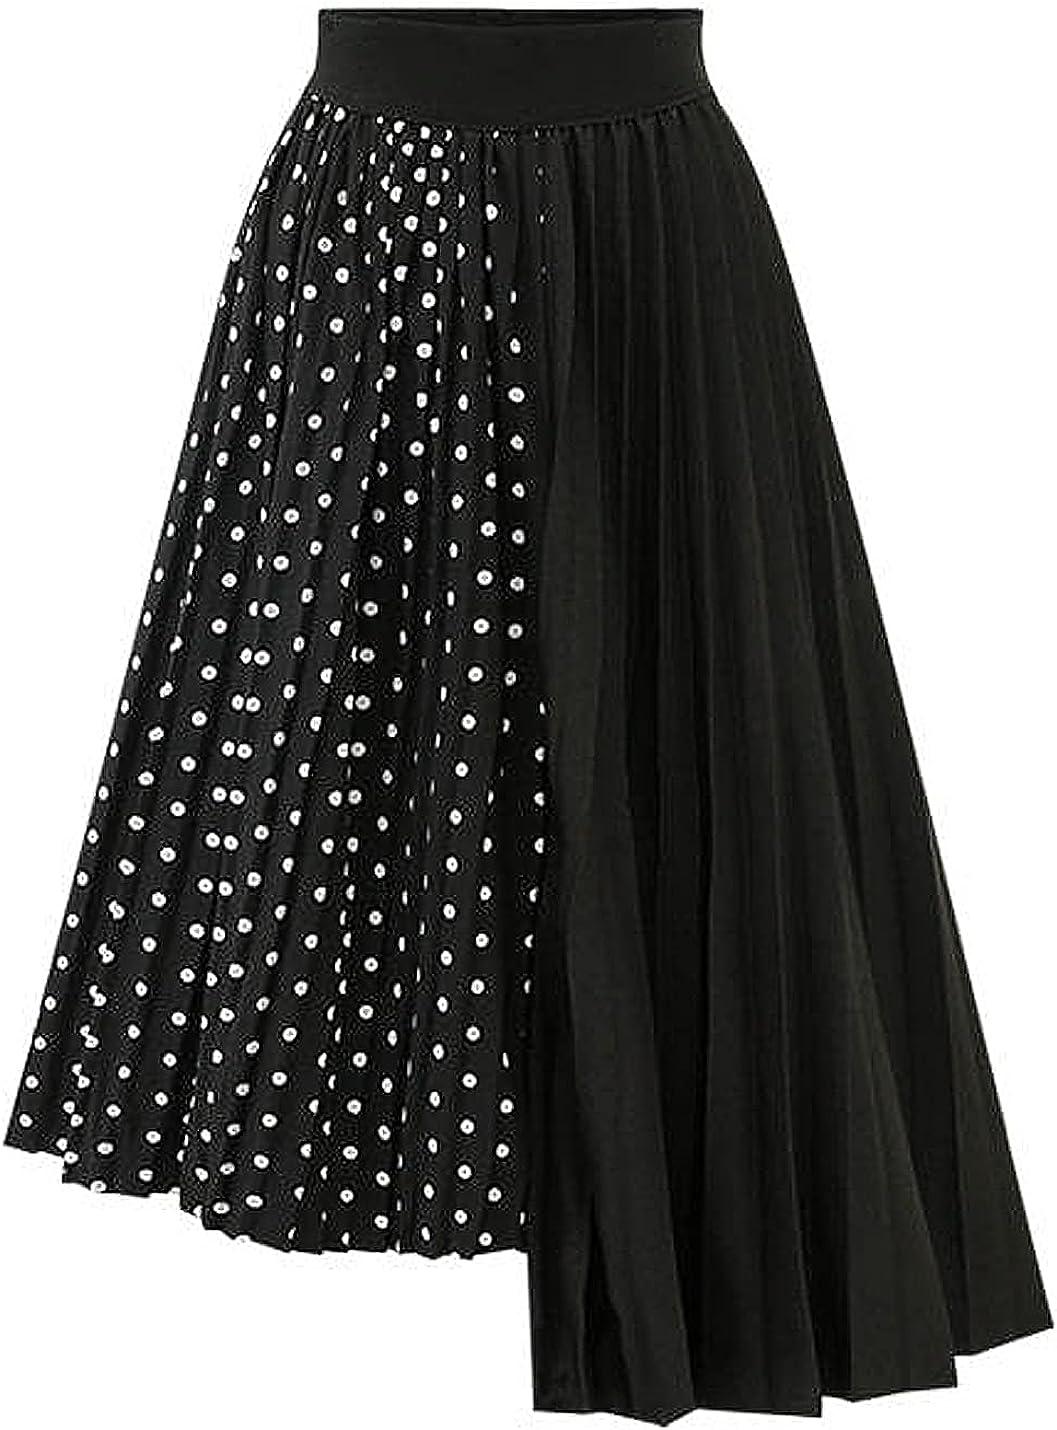 COWOKA Women's Polka Dot Stitching Irregular Chiffon Pleated Skirt Short Midi Casual Dress